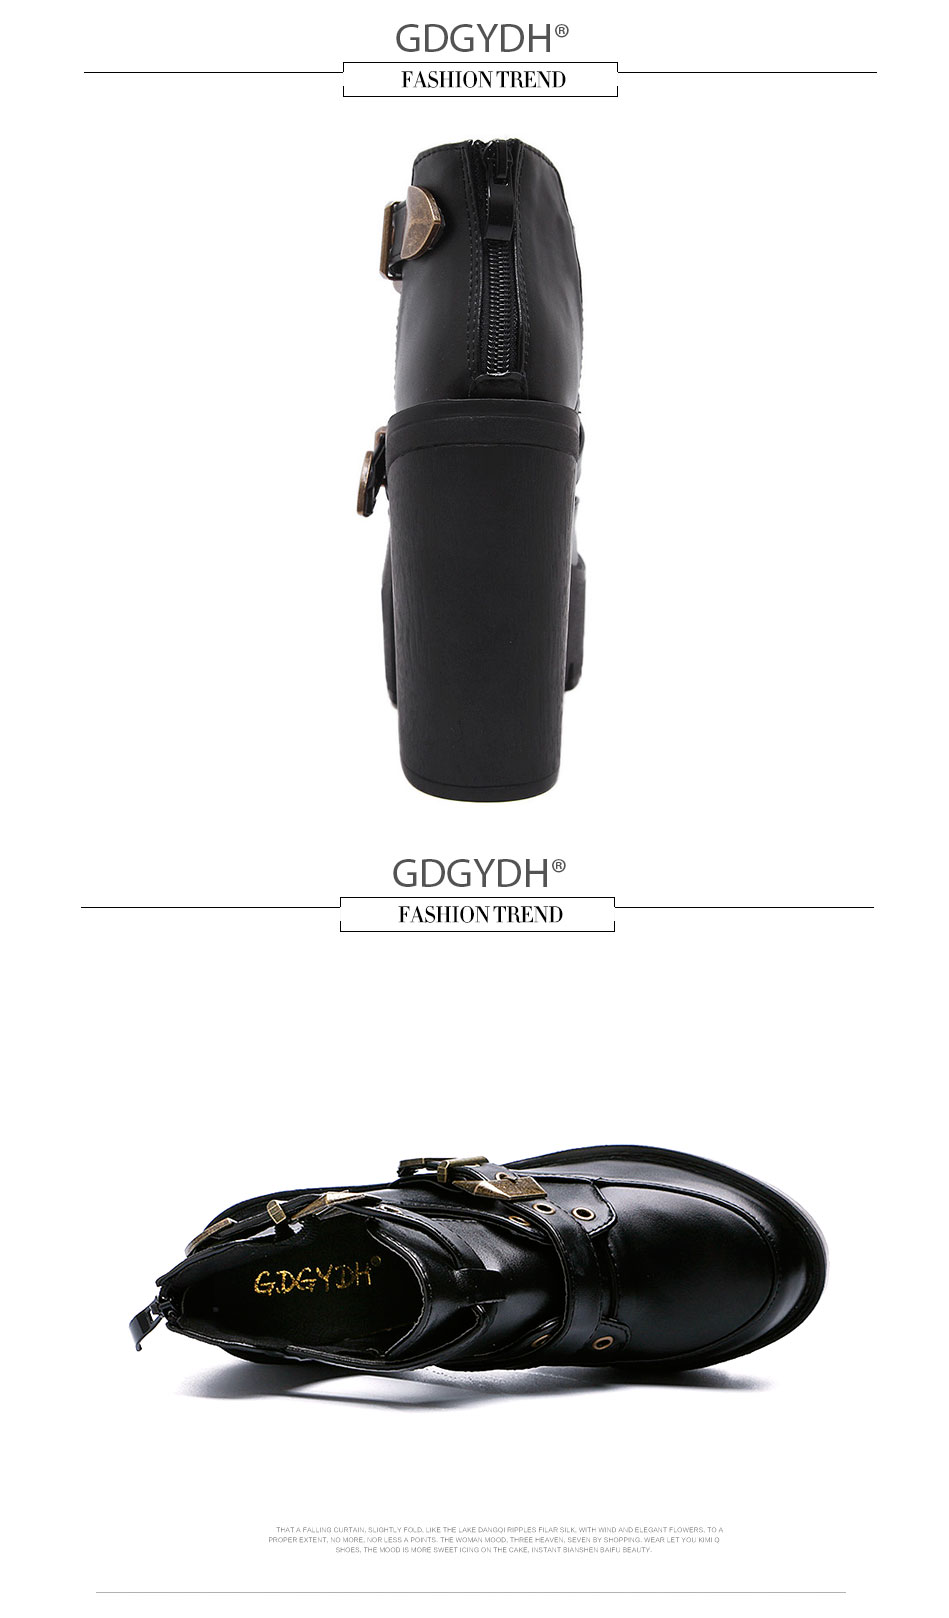 960720cf0bb Gdgydh 2018 new spring autumn casual high-heeled shoes sexy ruslana  korshunova thick heels platform pumps Black White Size 42USD  22.93-28.03 pair